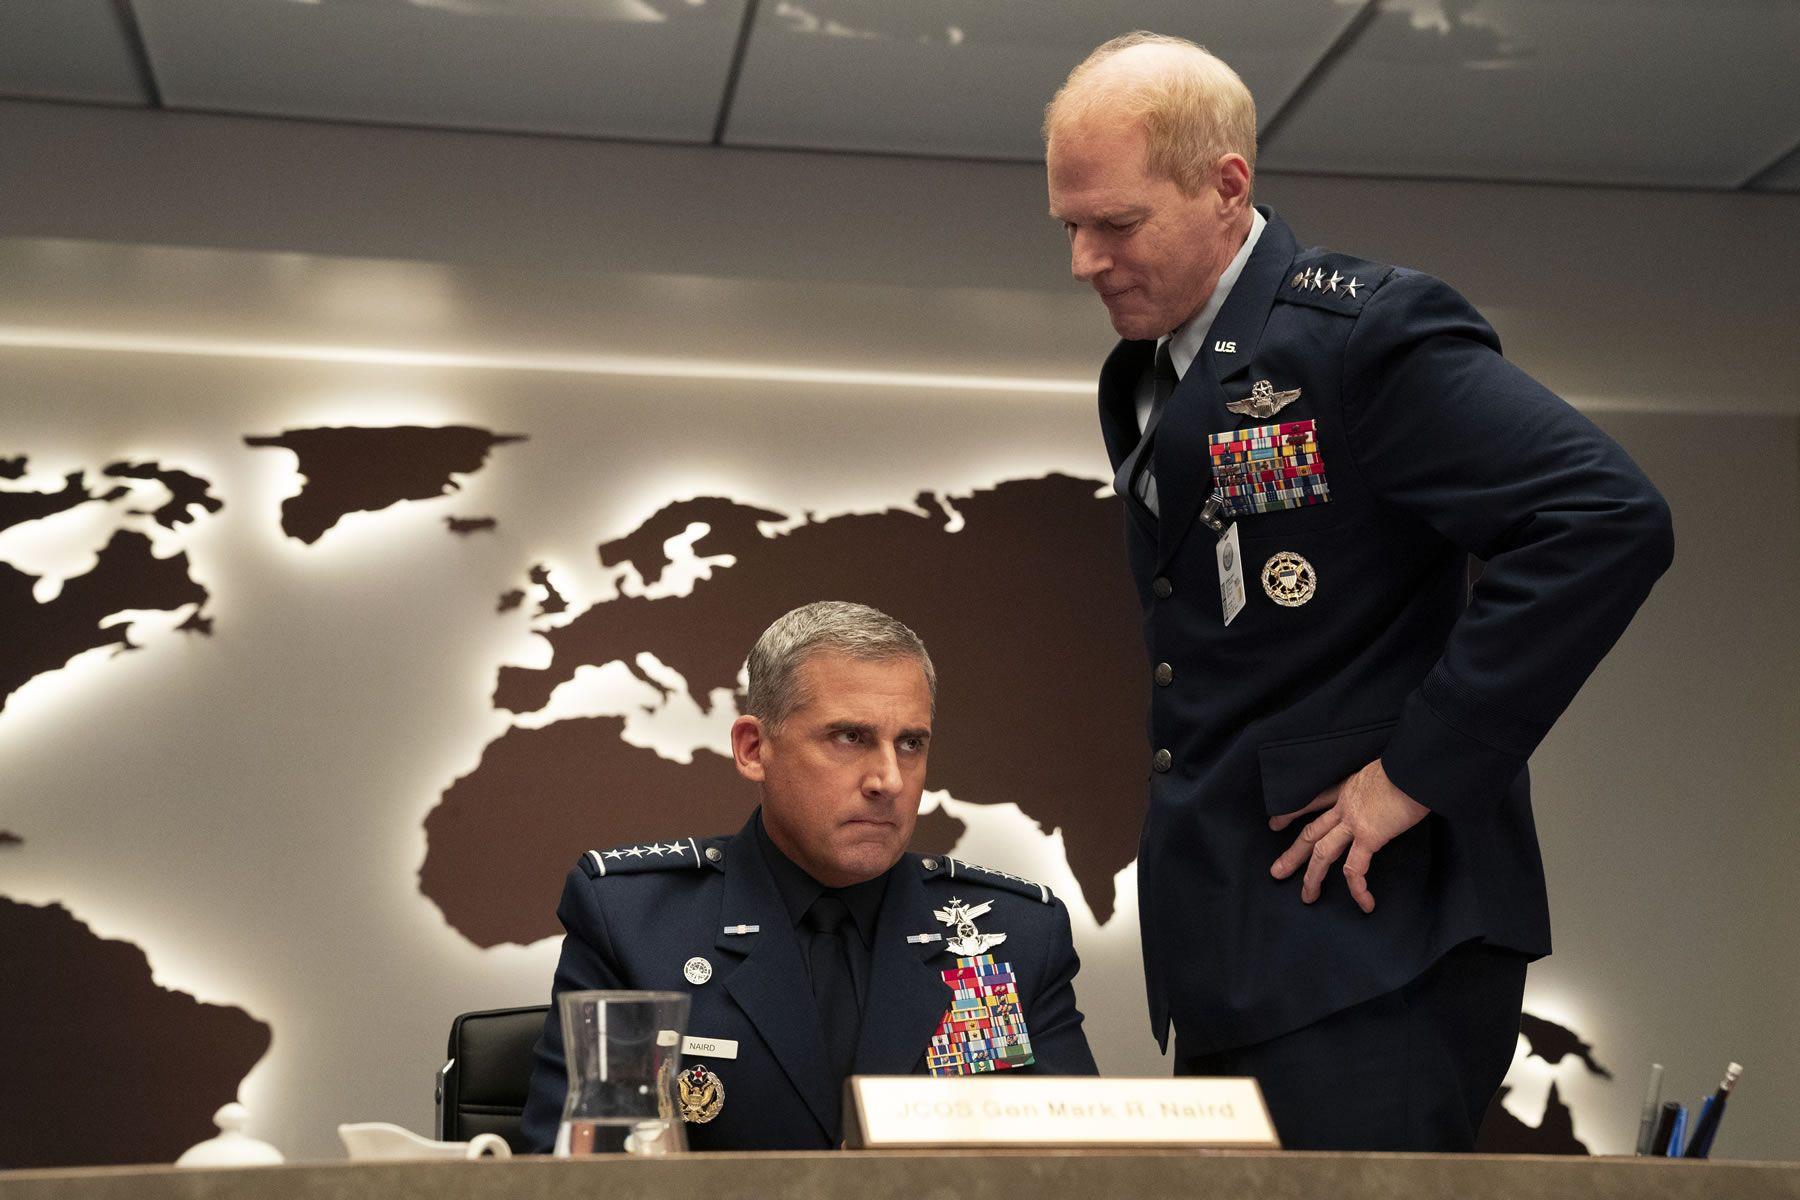 Space Force Trailer: Steve Carell Netflix Show Sneak Peek Is Here ...